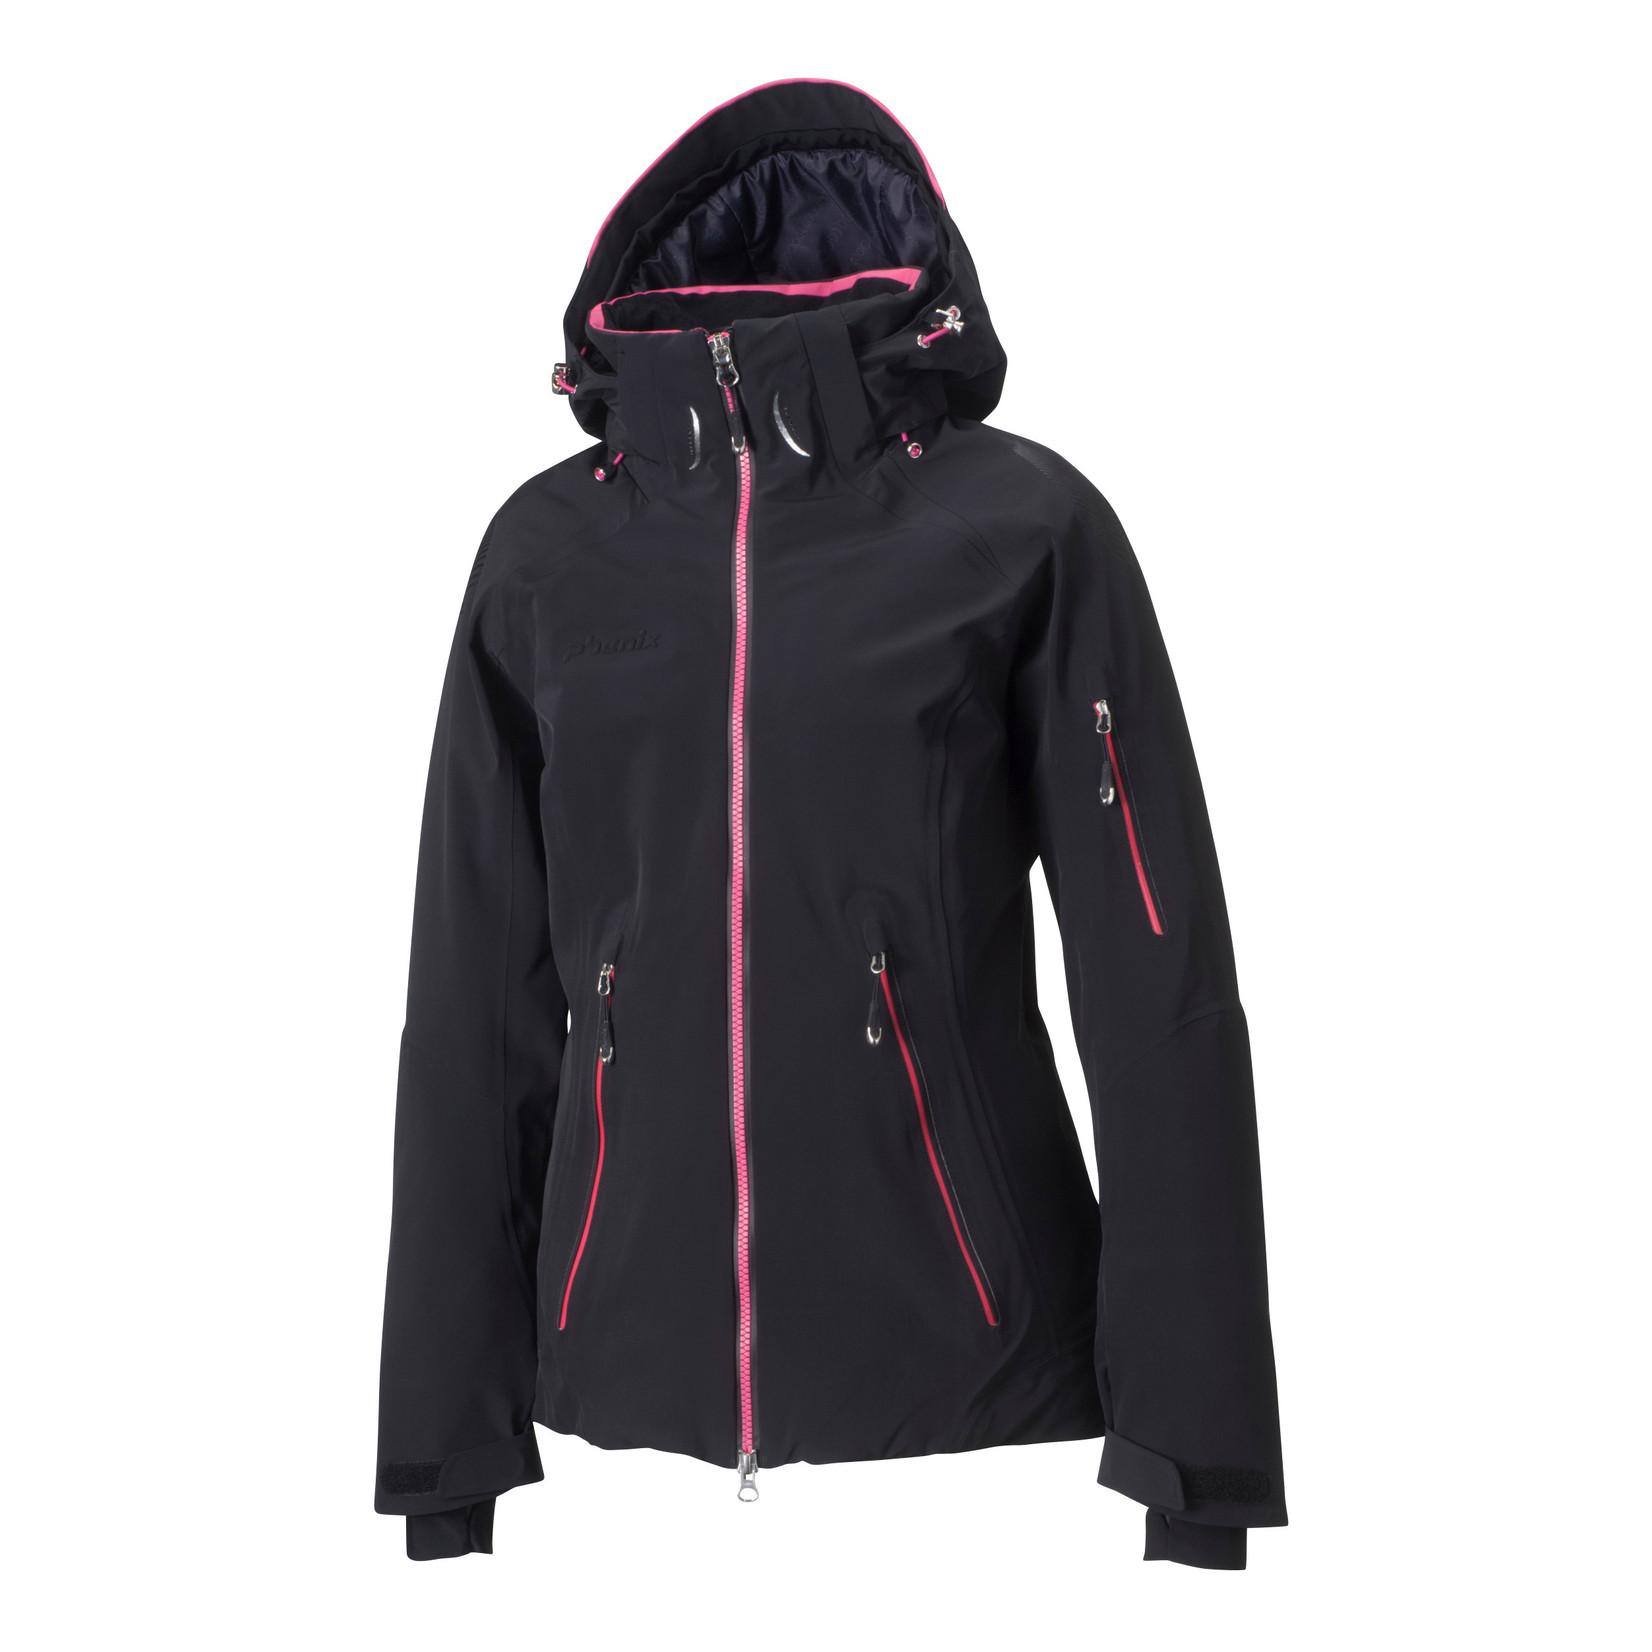 PHENIX Crescent Jacket